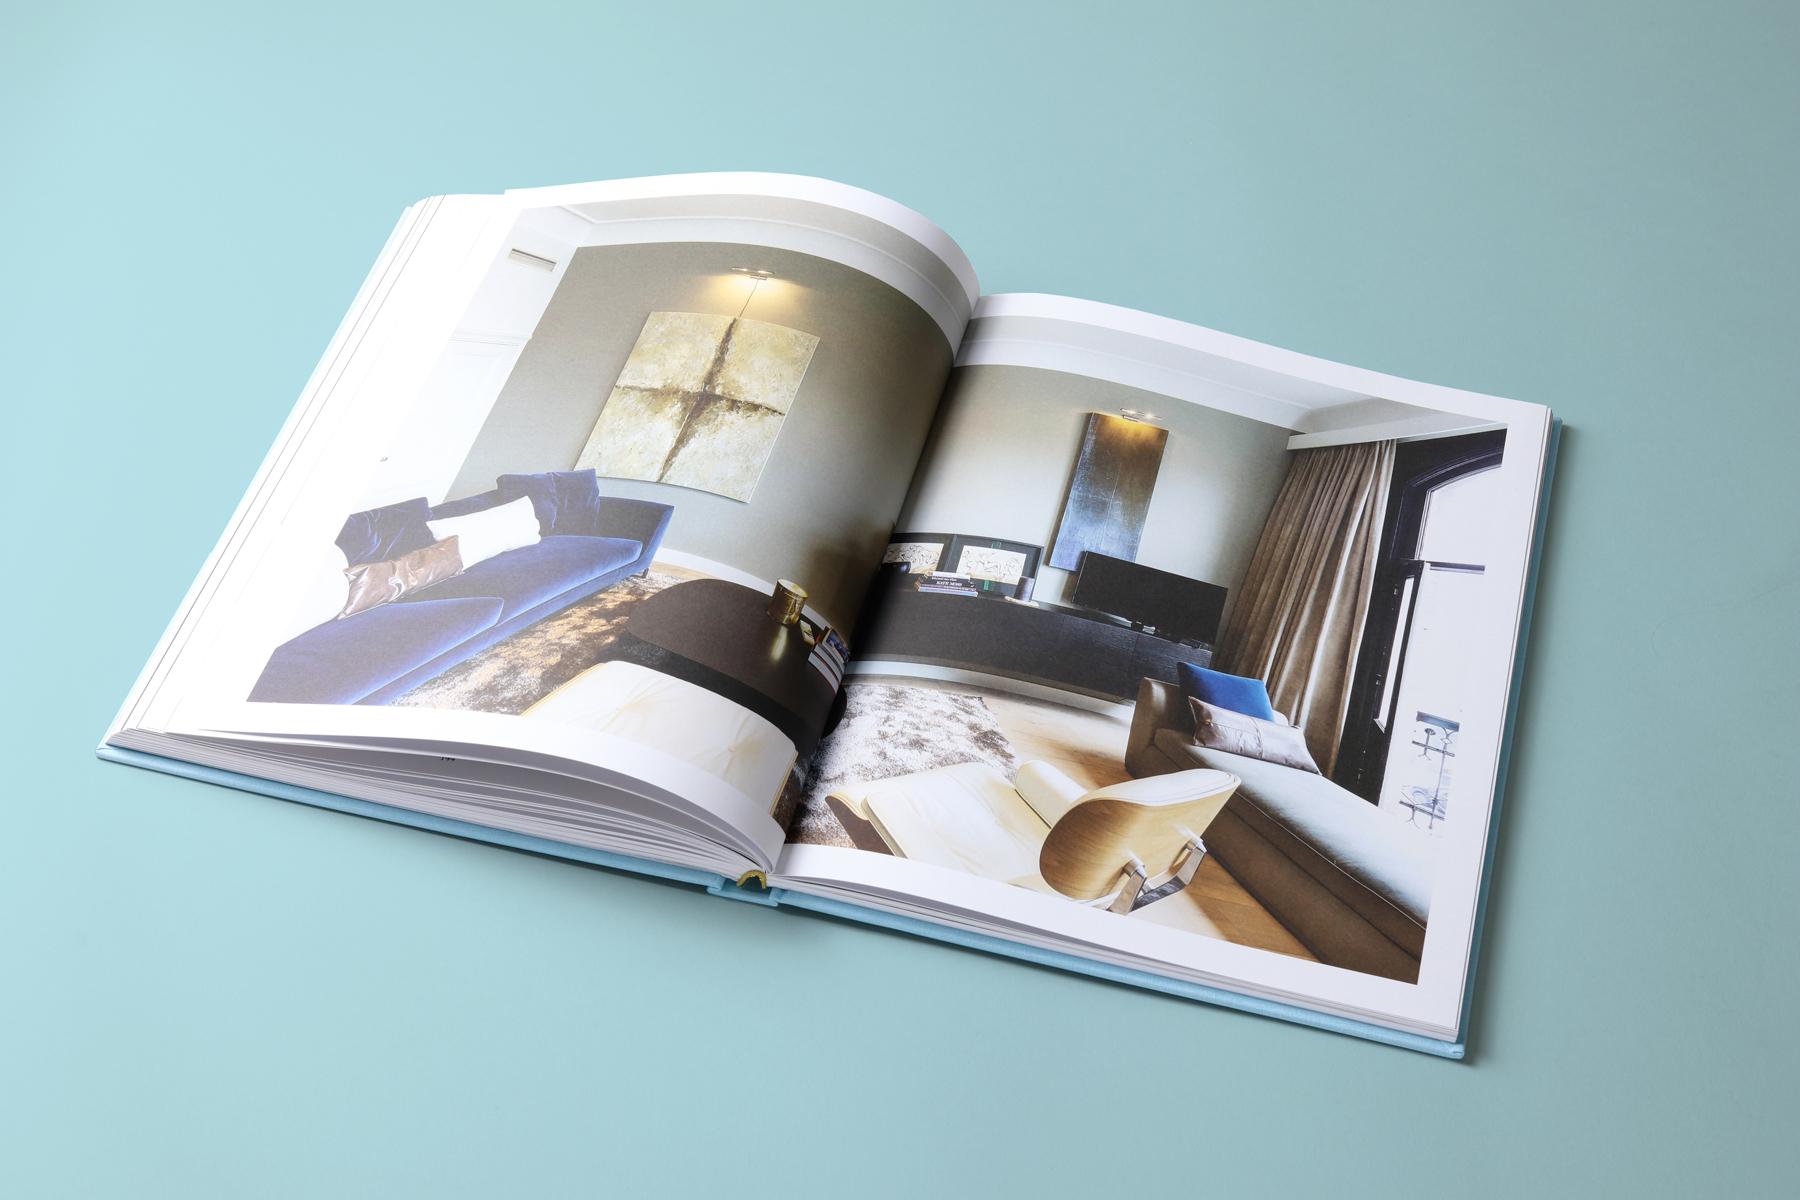 living-in-style-book-studio-hermanides-page-158.jpg